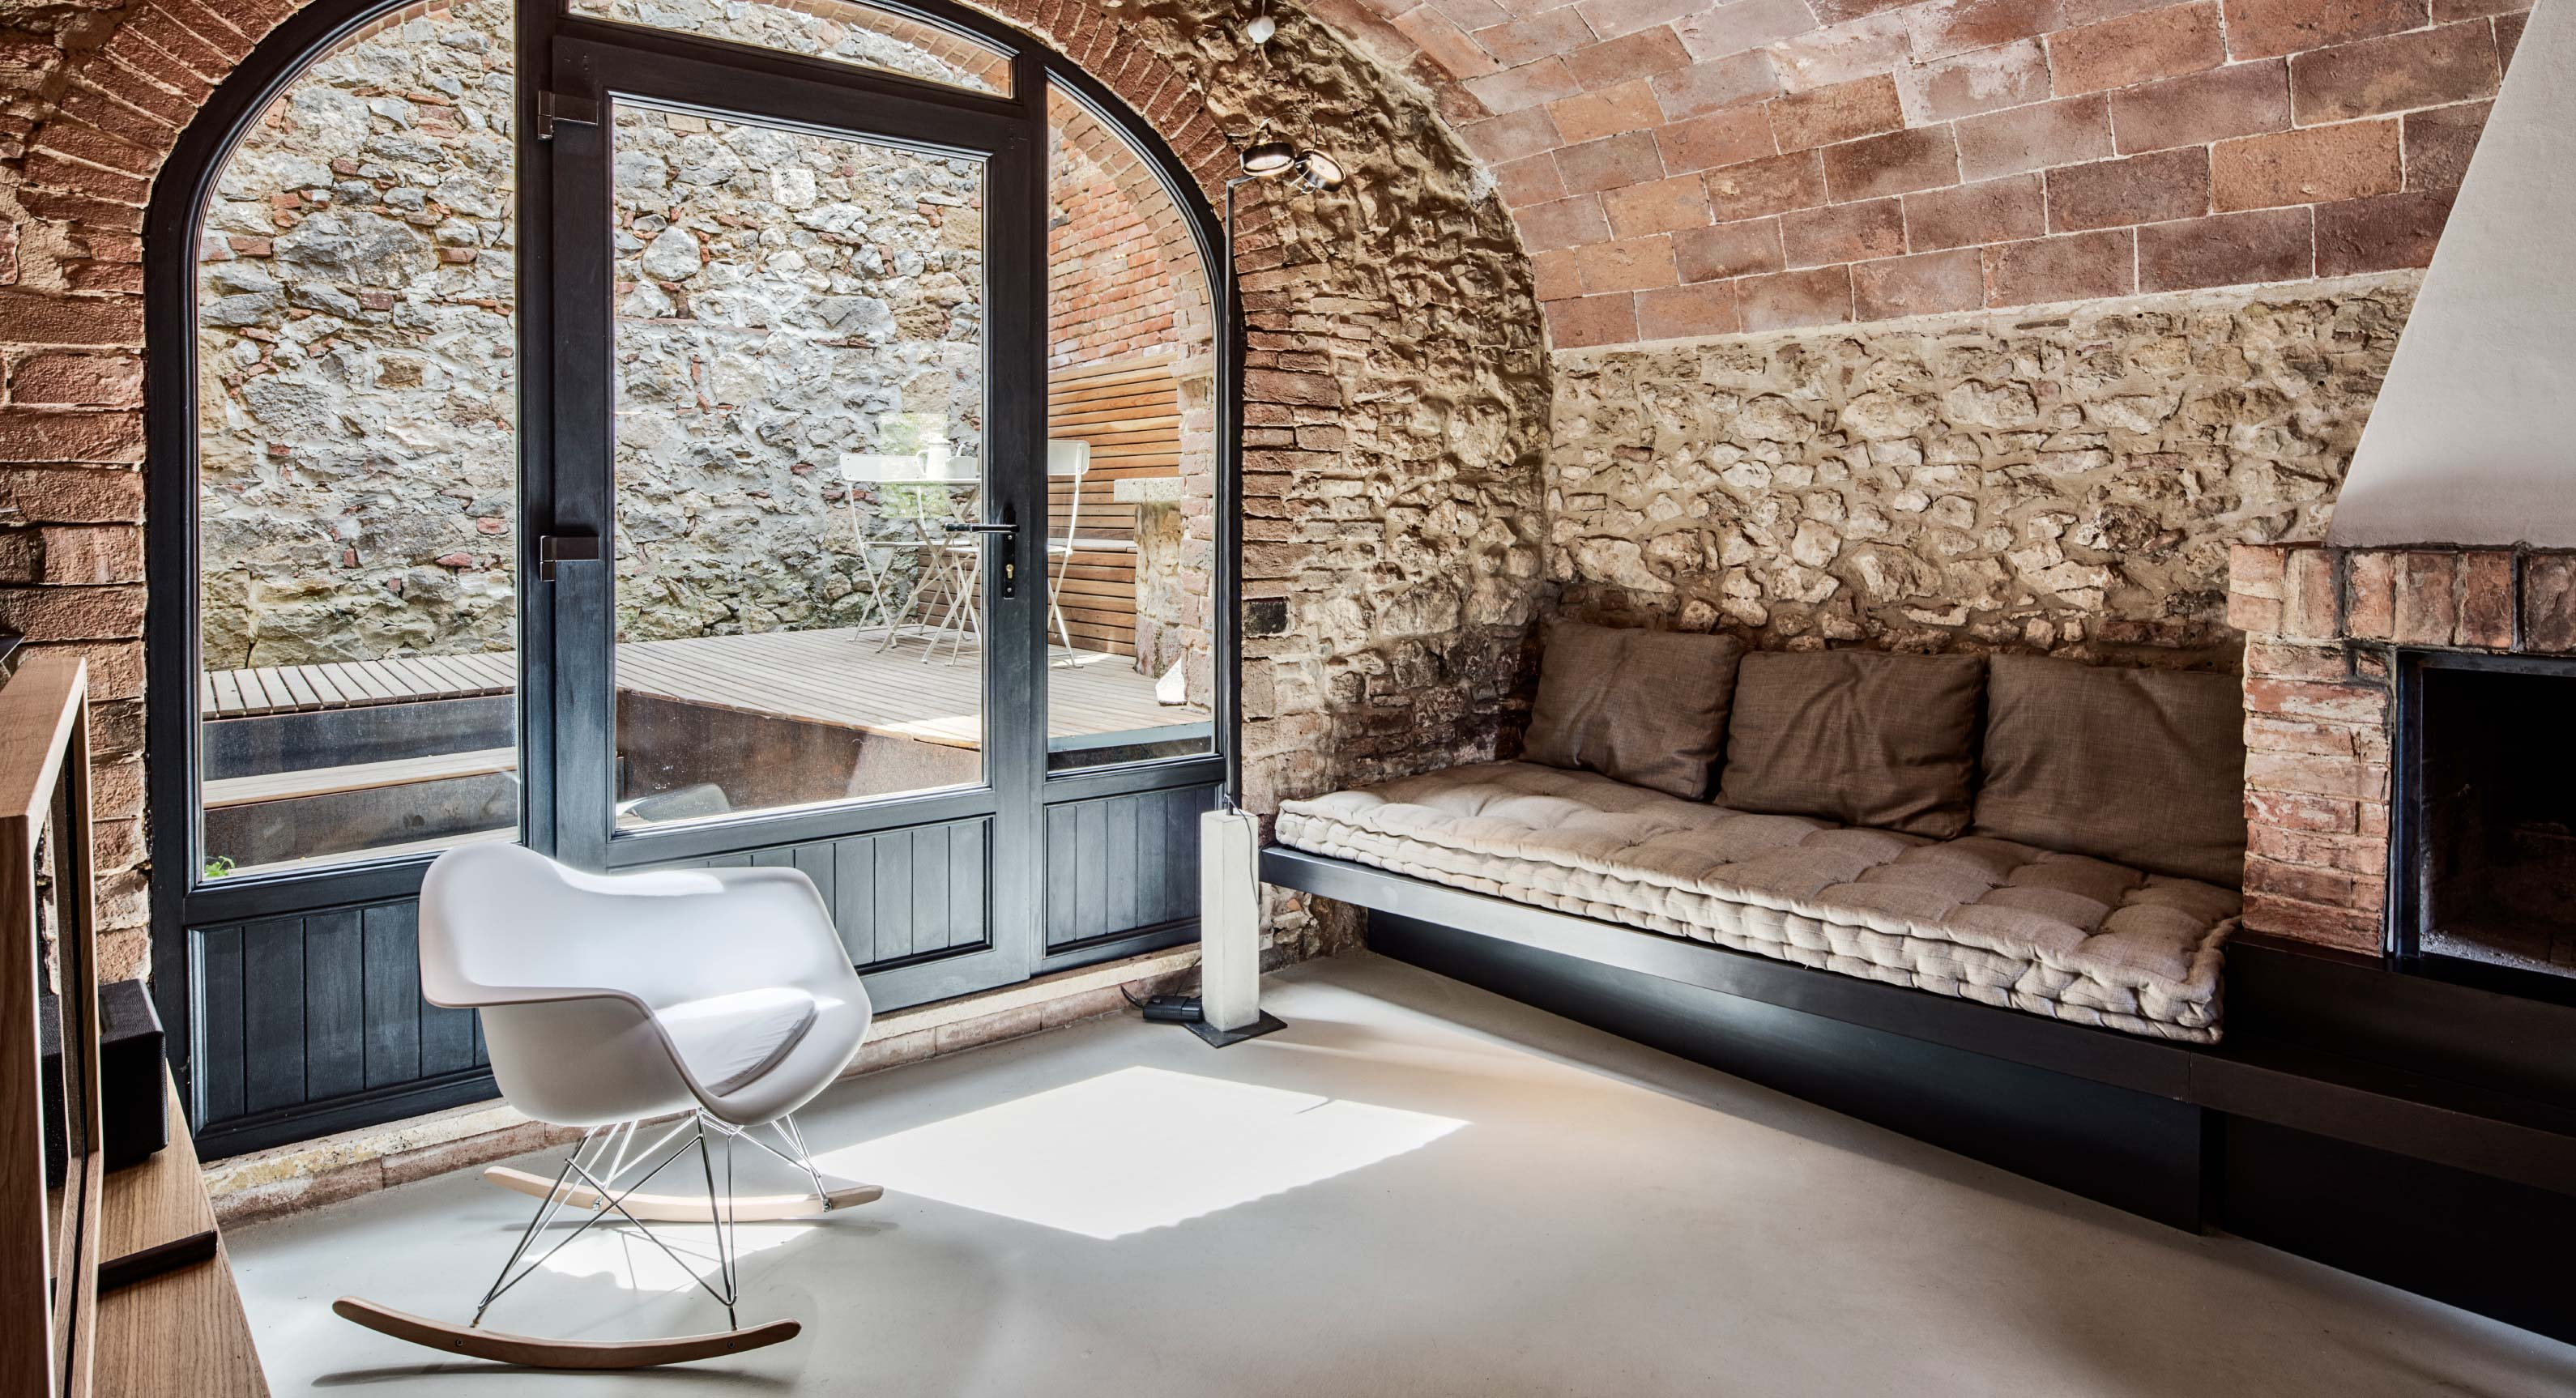 Archiplan Studio Transform This Tuscan Hideaway Through Small & Ingenious Interventions